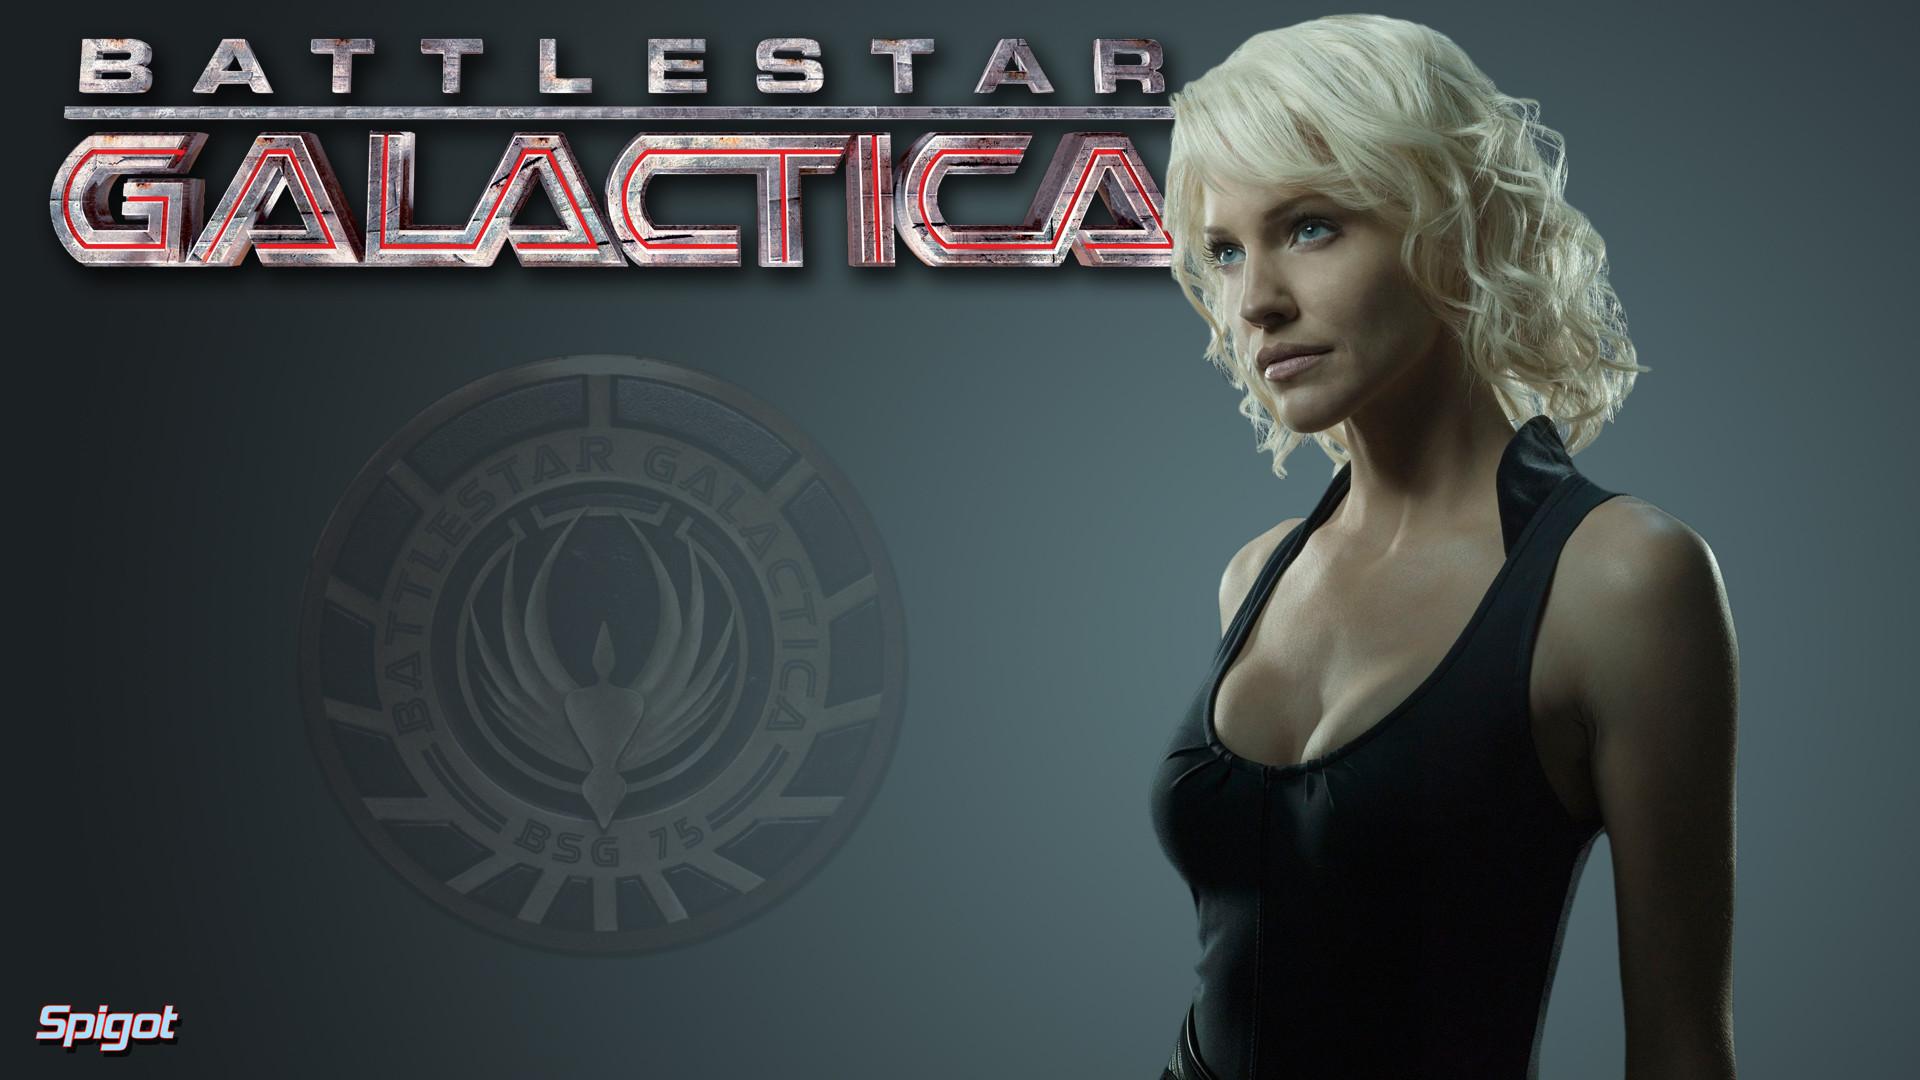 More Battlestar Galactica Wallpapers